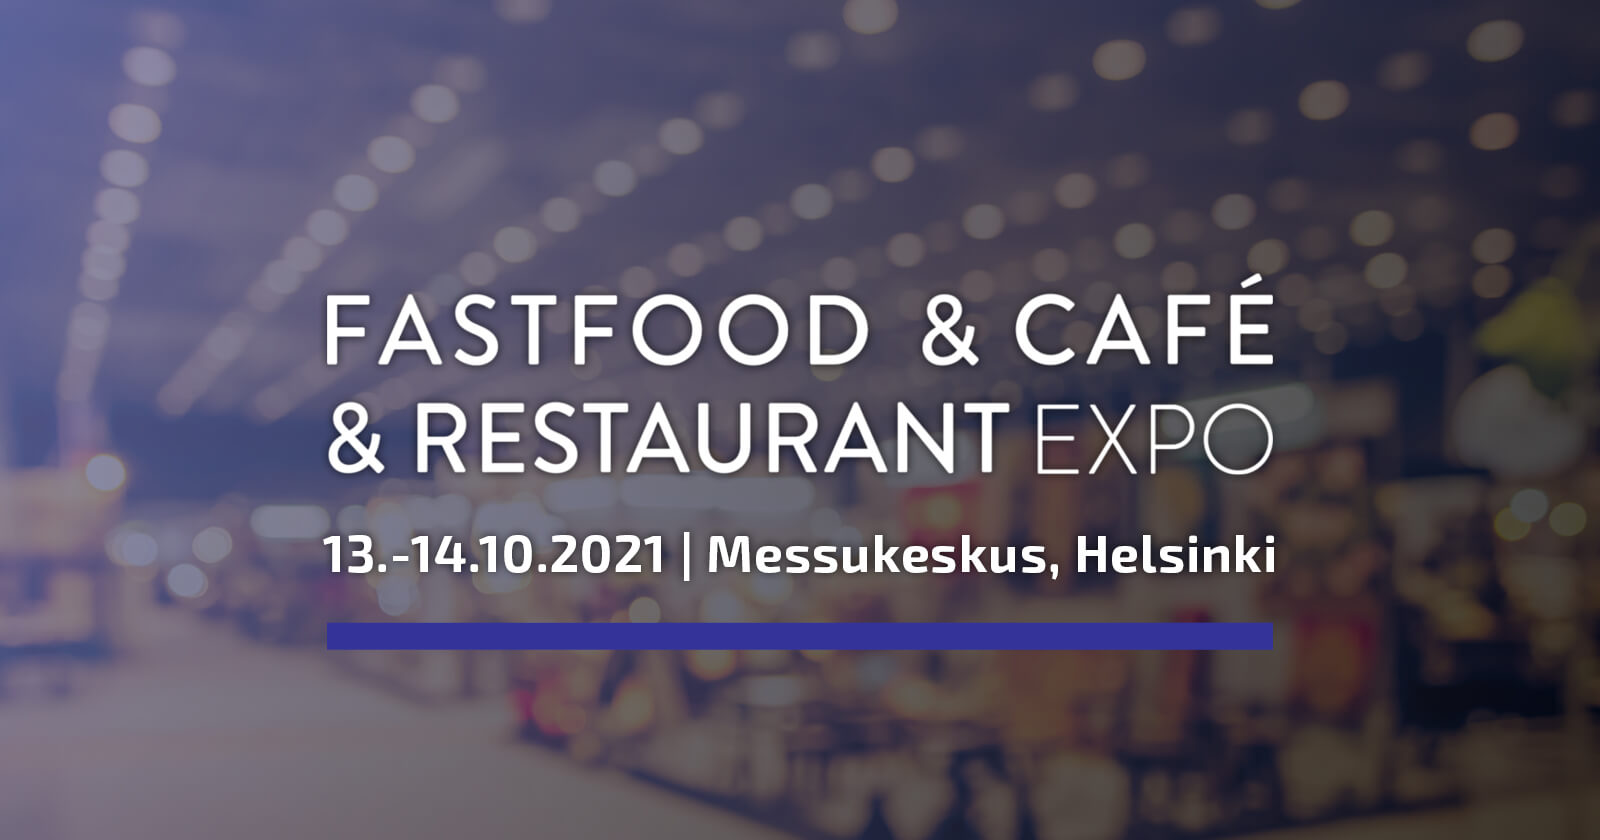 Staffmax Fastfood & Cafe & Restaurant Expossa 2021